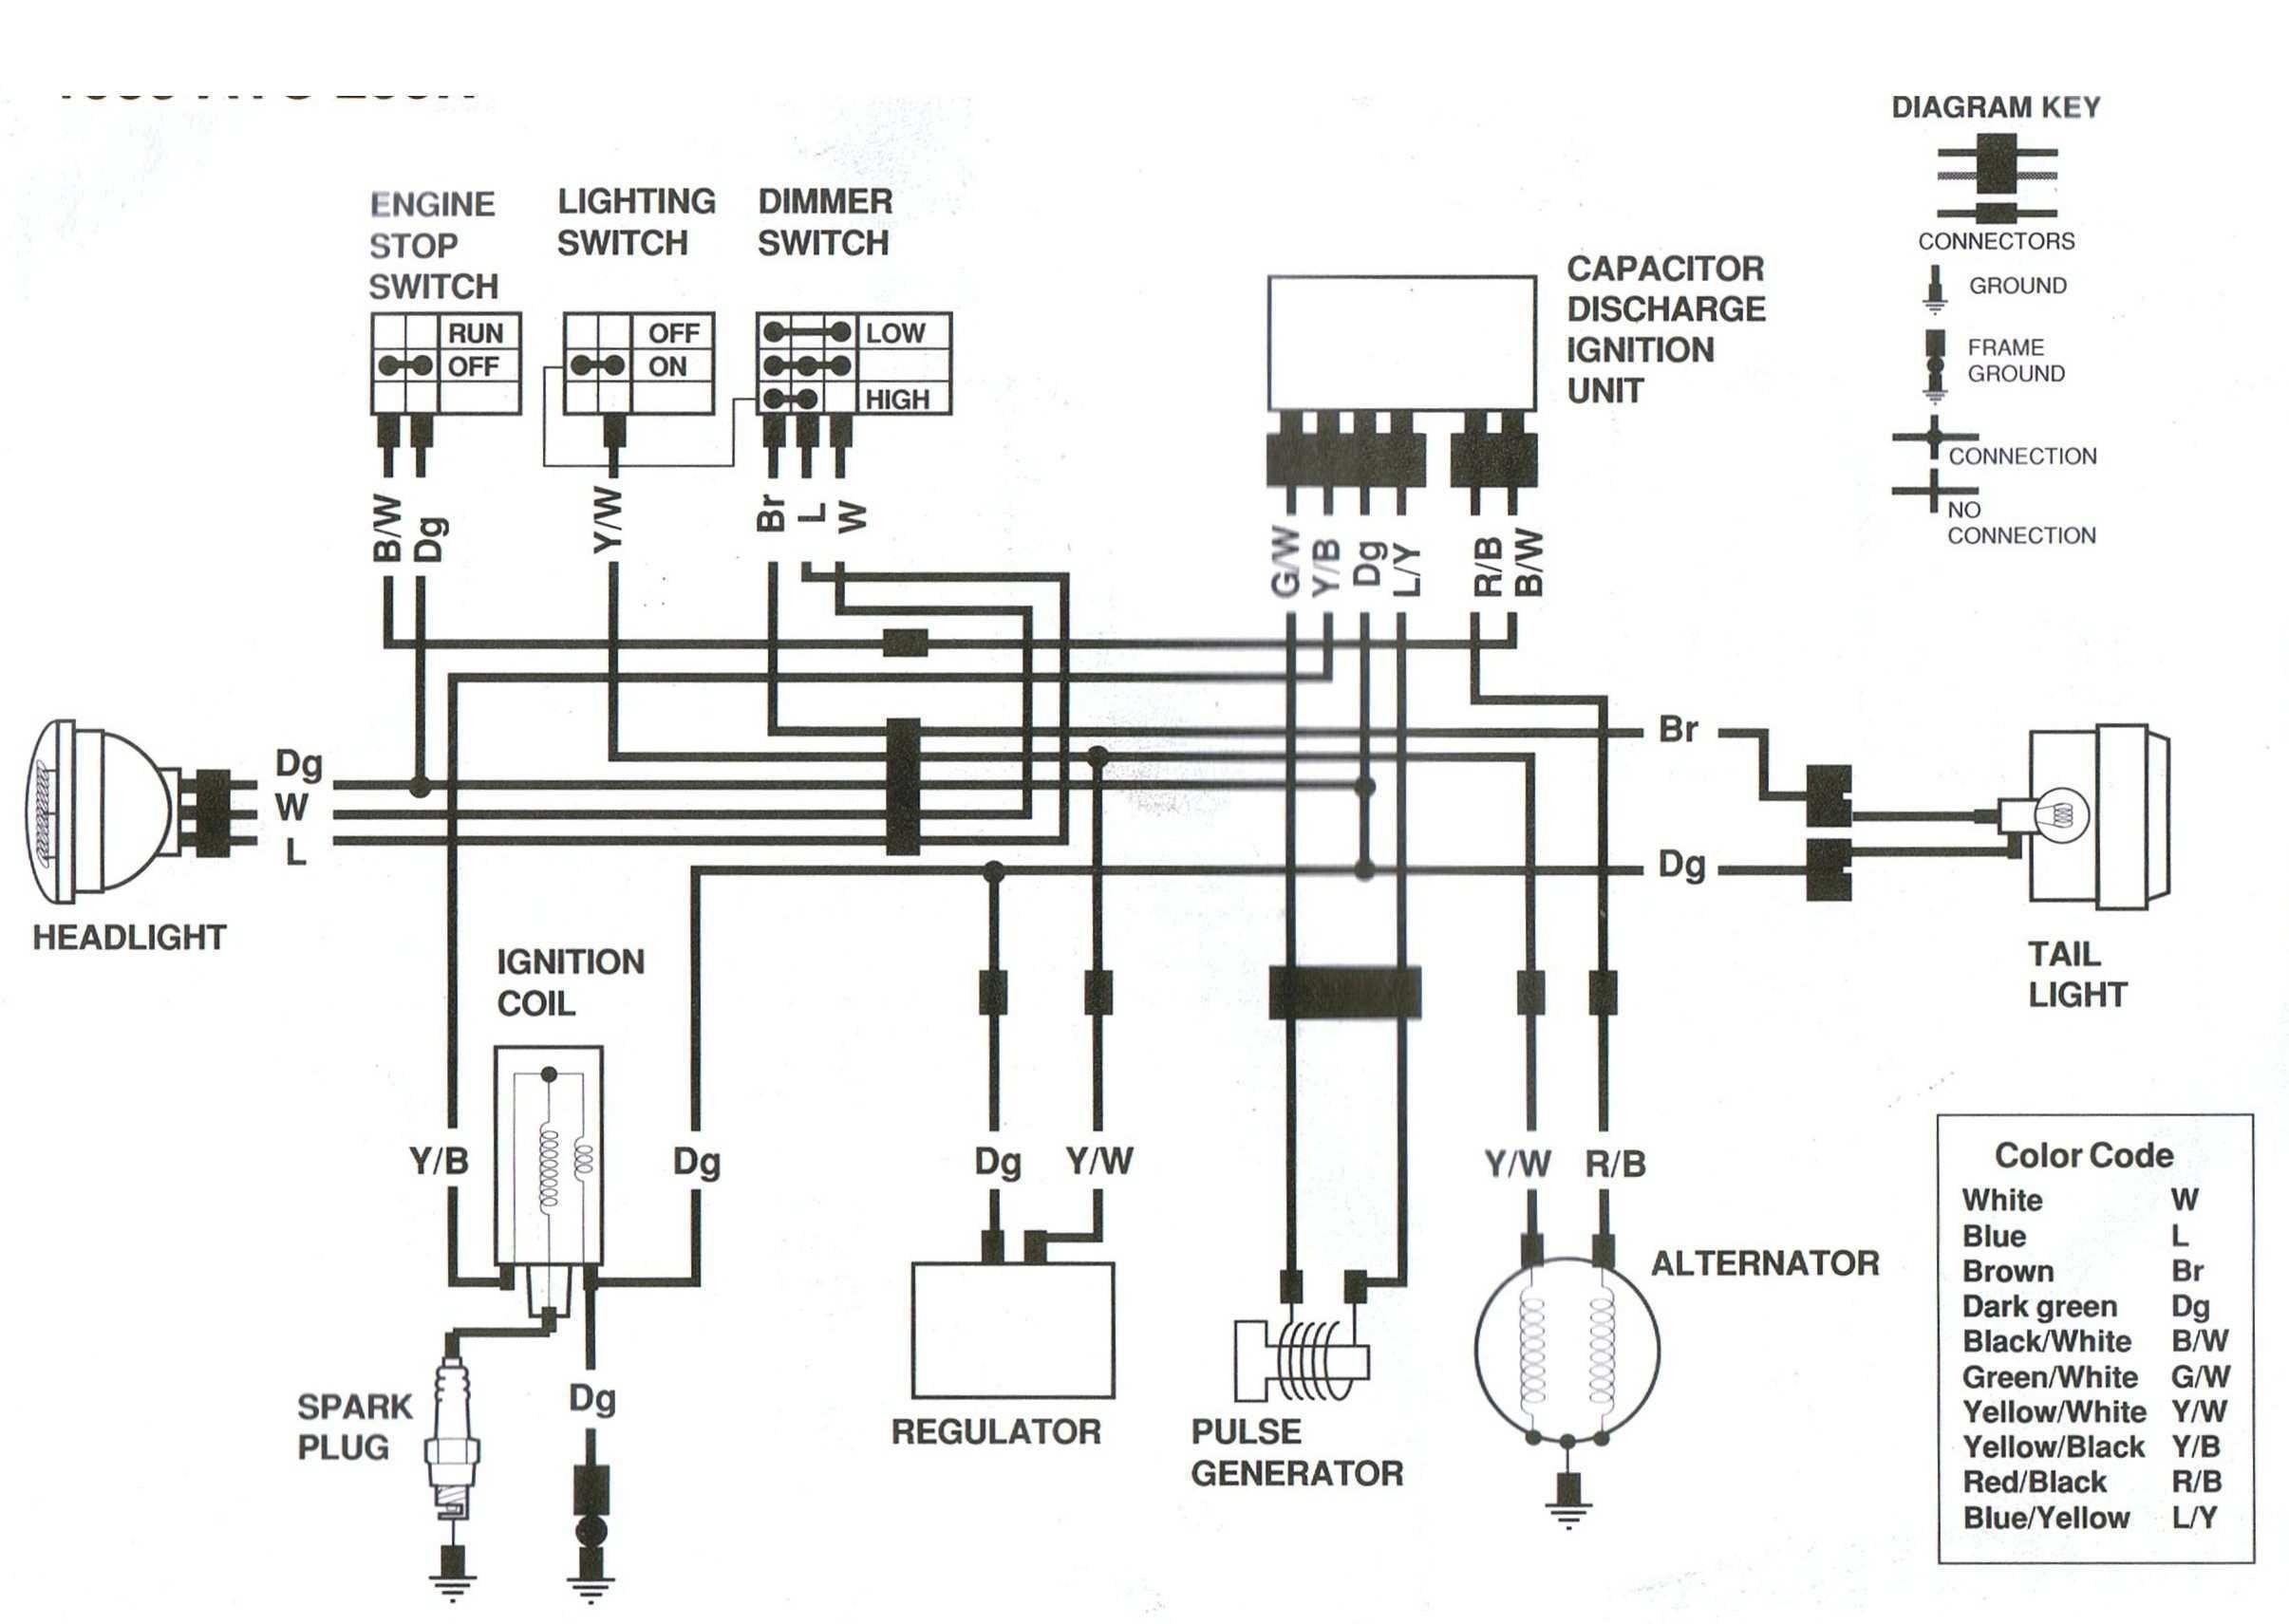 1988 yamaha banshee wiring diagram auto electrical wiring diagram u2022 rh softwarekart co 1994 Yamaha Kodiak